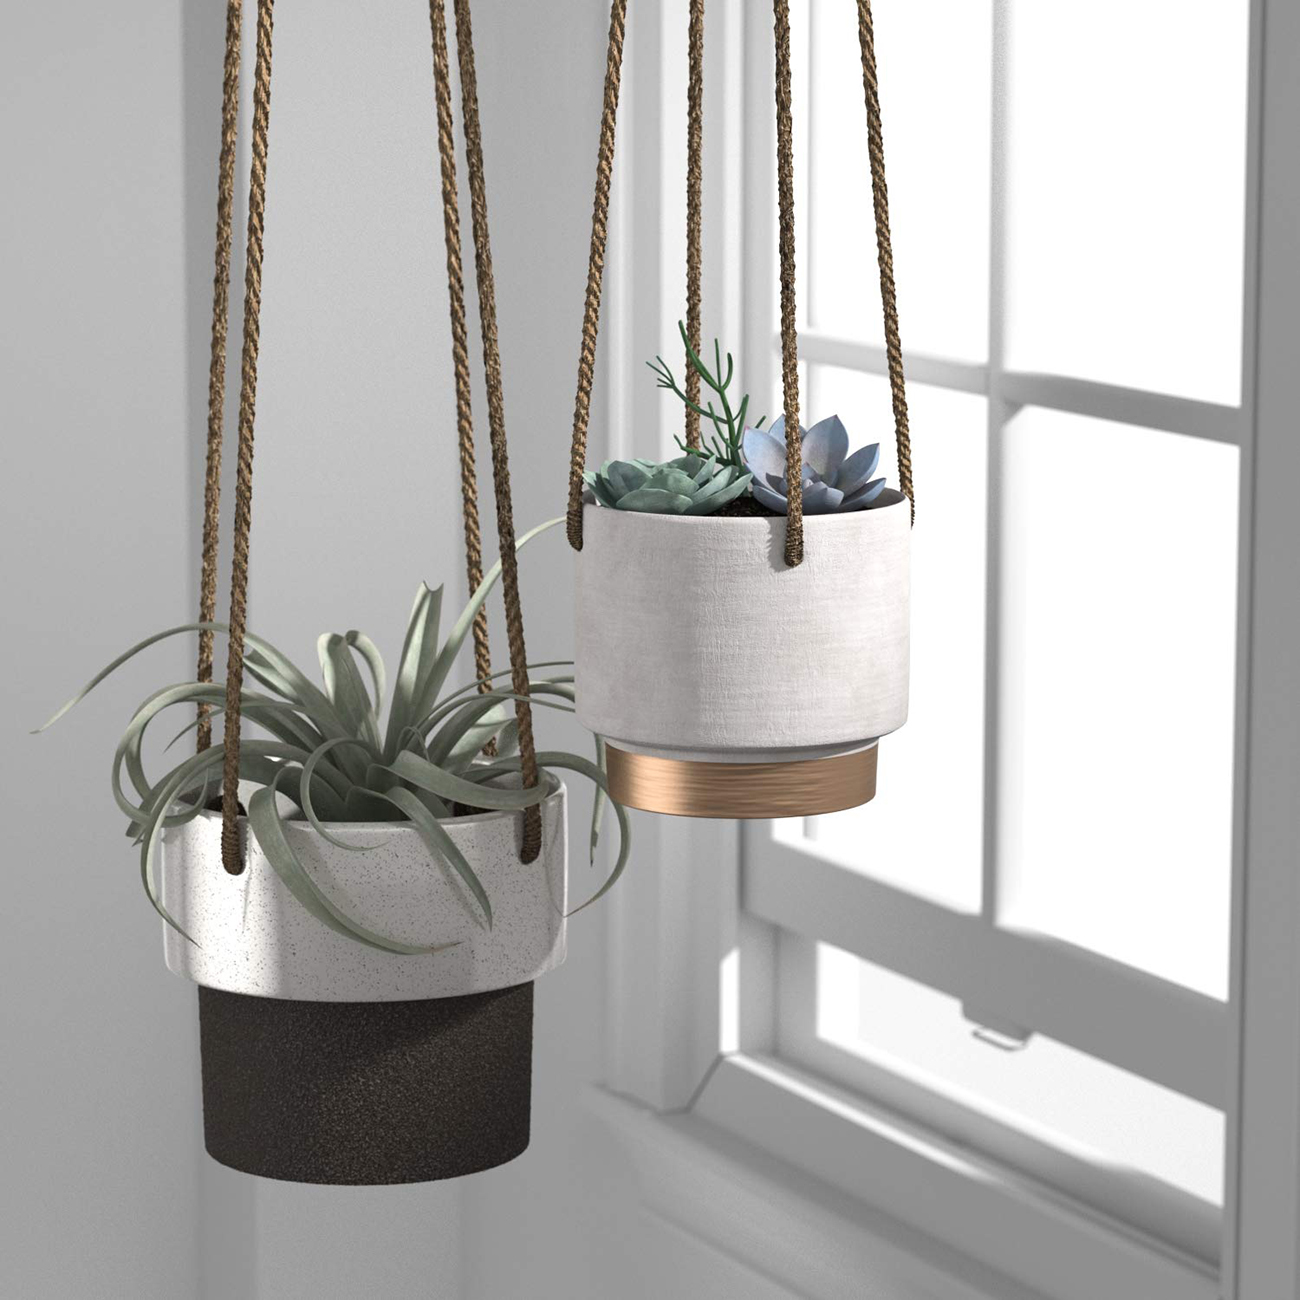 mid-century hanging plants